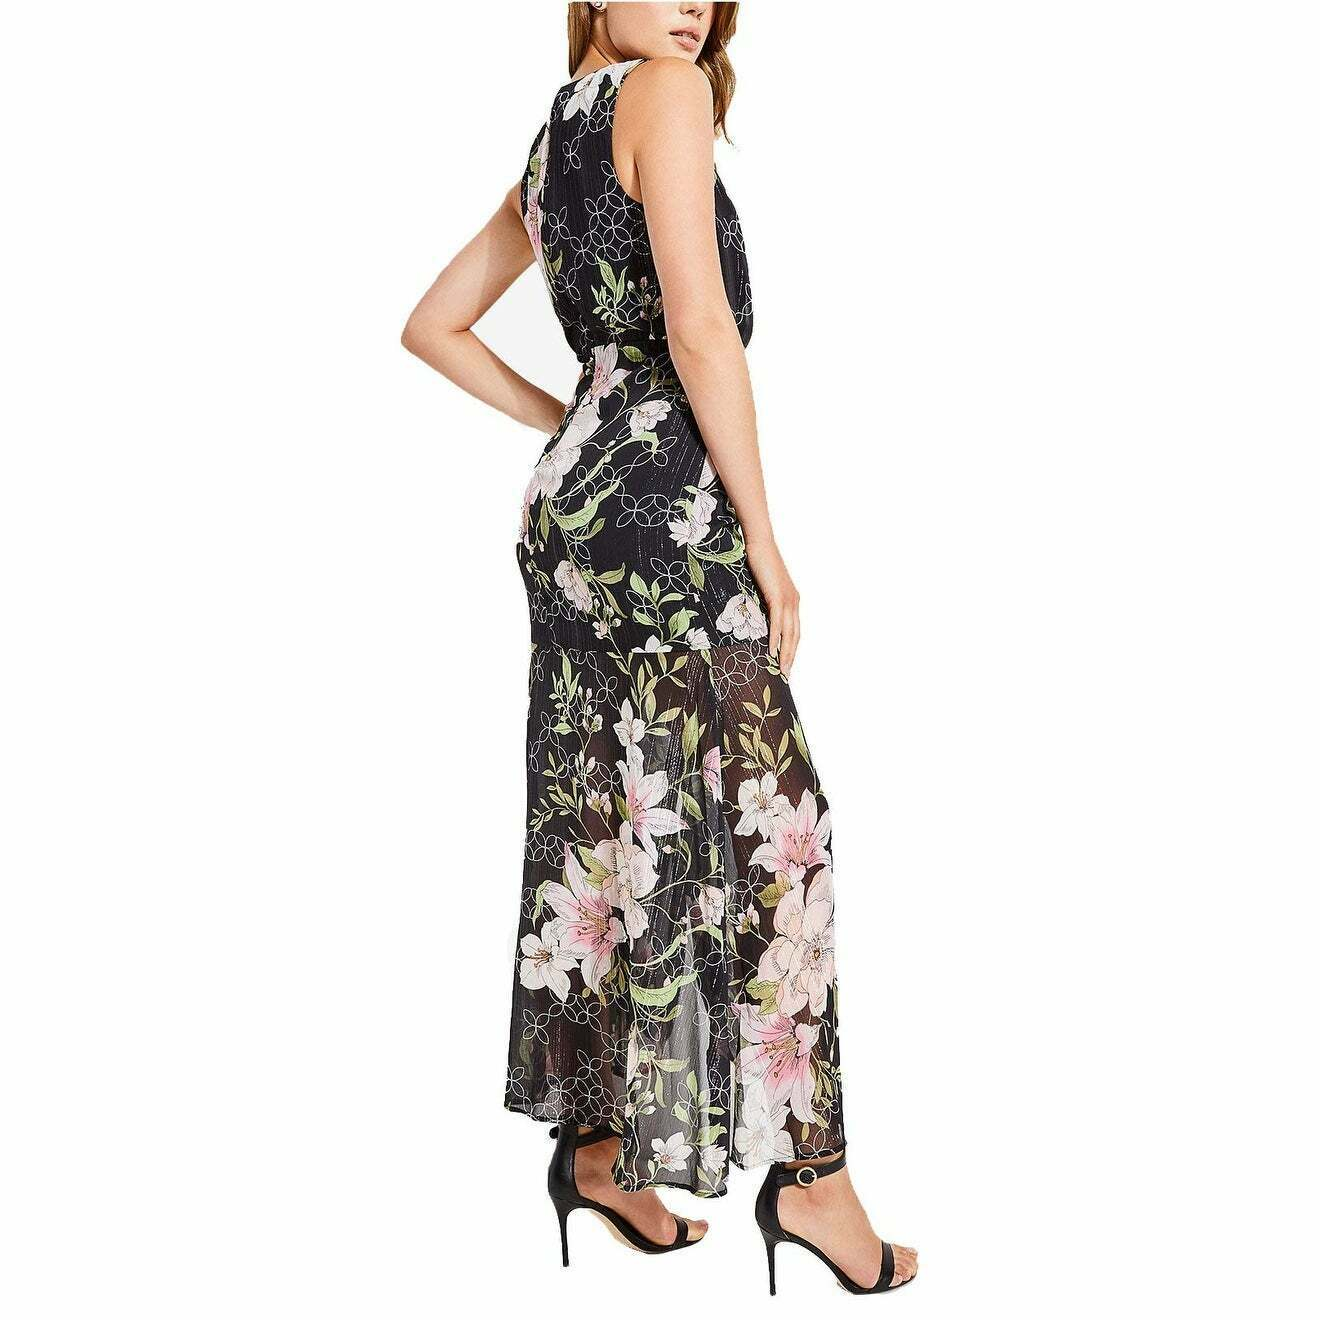 Aqua Womens B//W Sheer Tiered Special Occasion Maxi Dress Gown L BHFO 8622